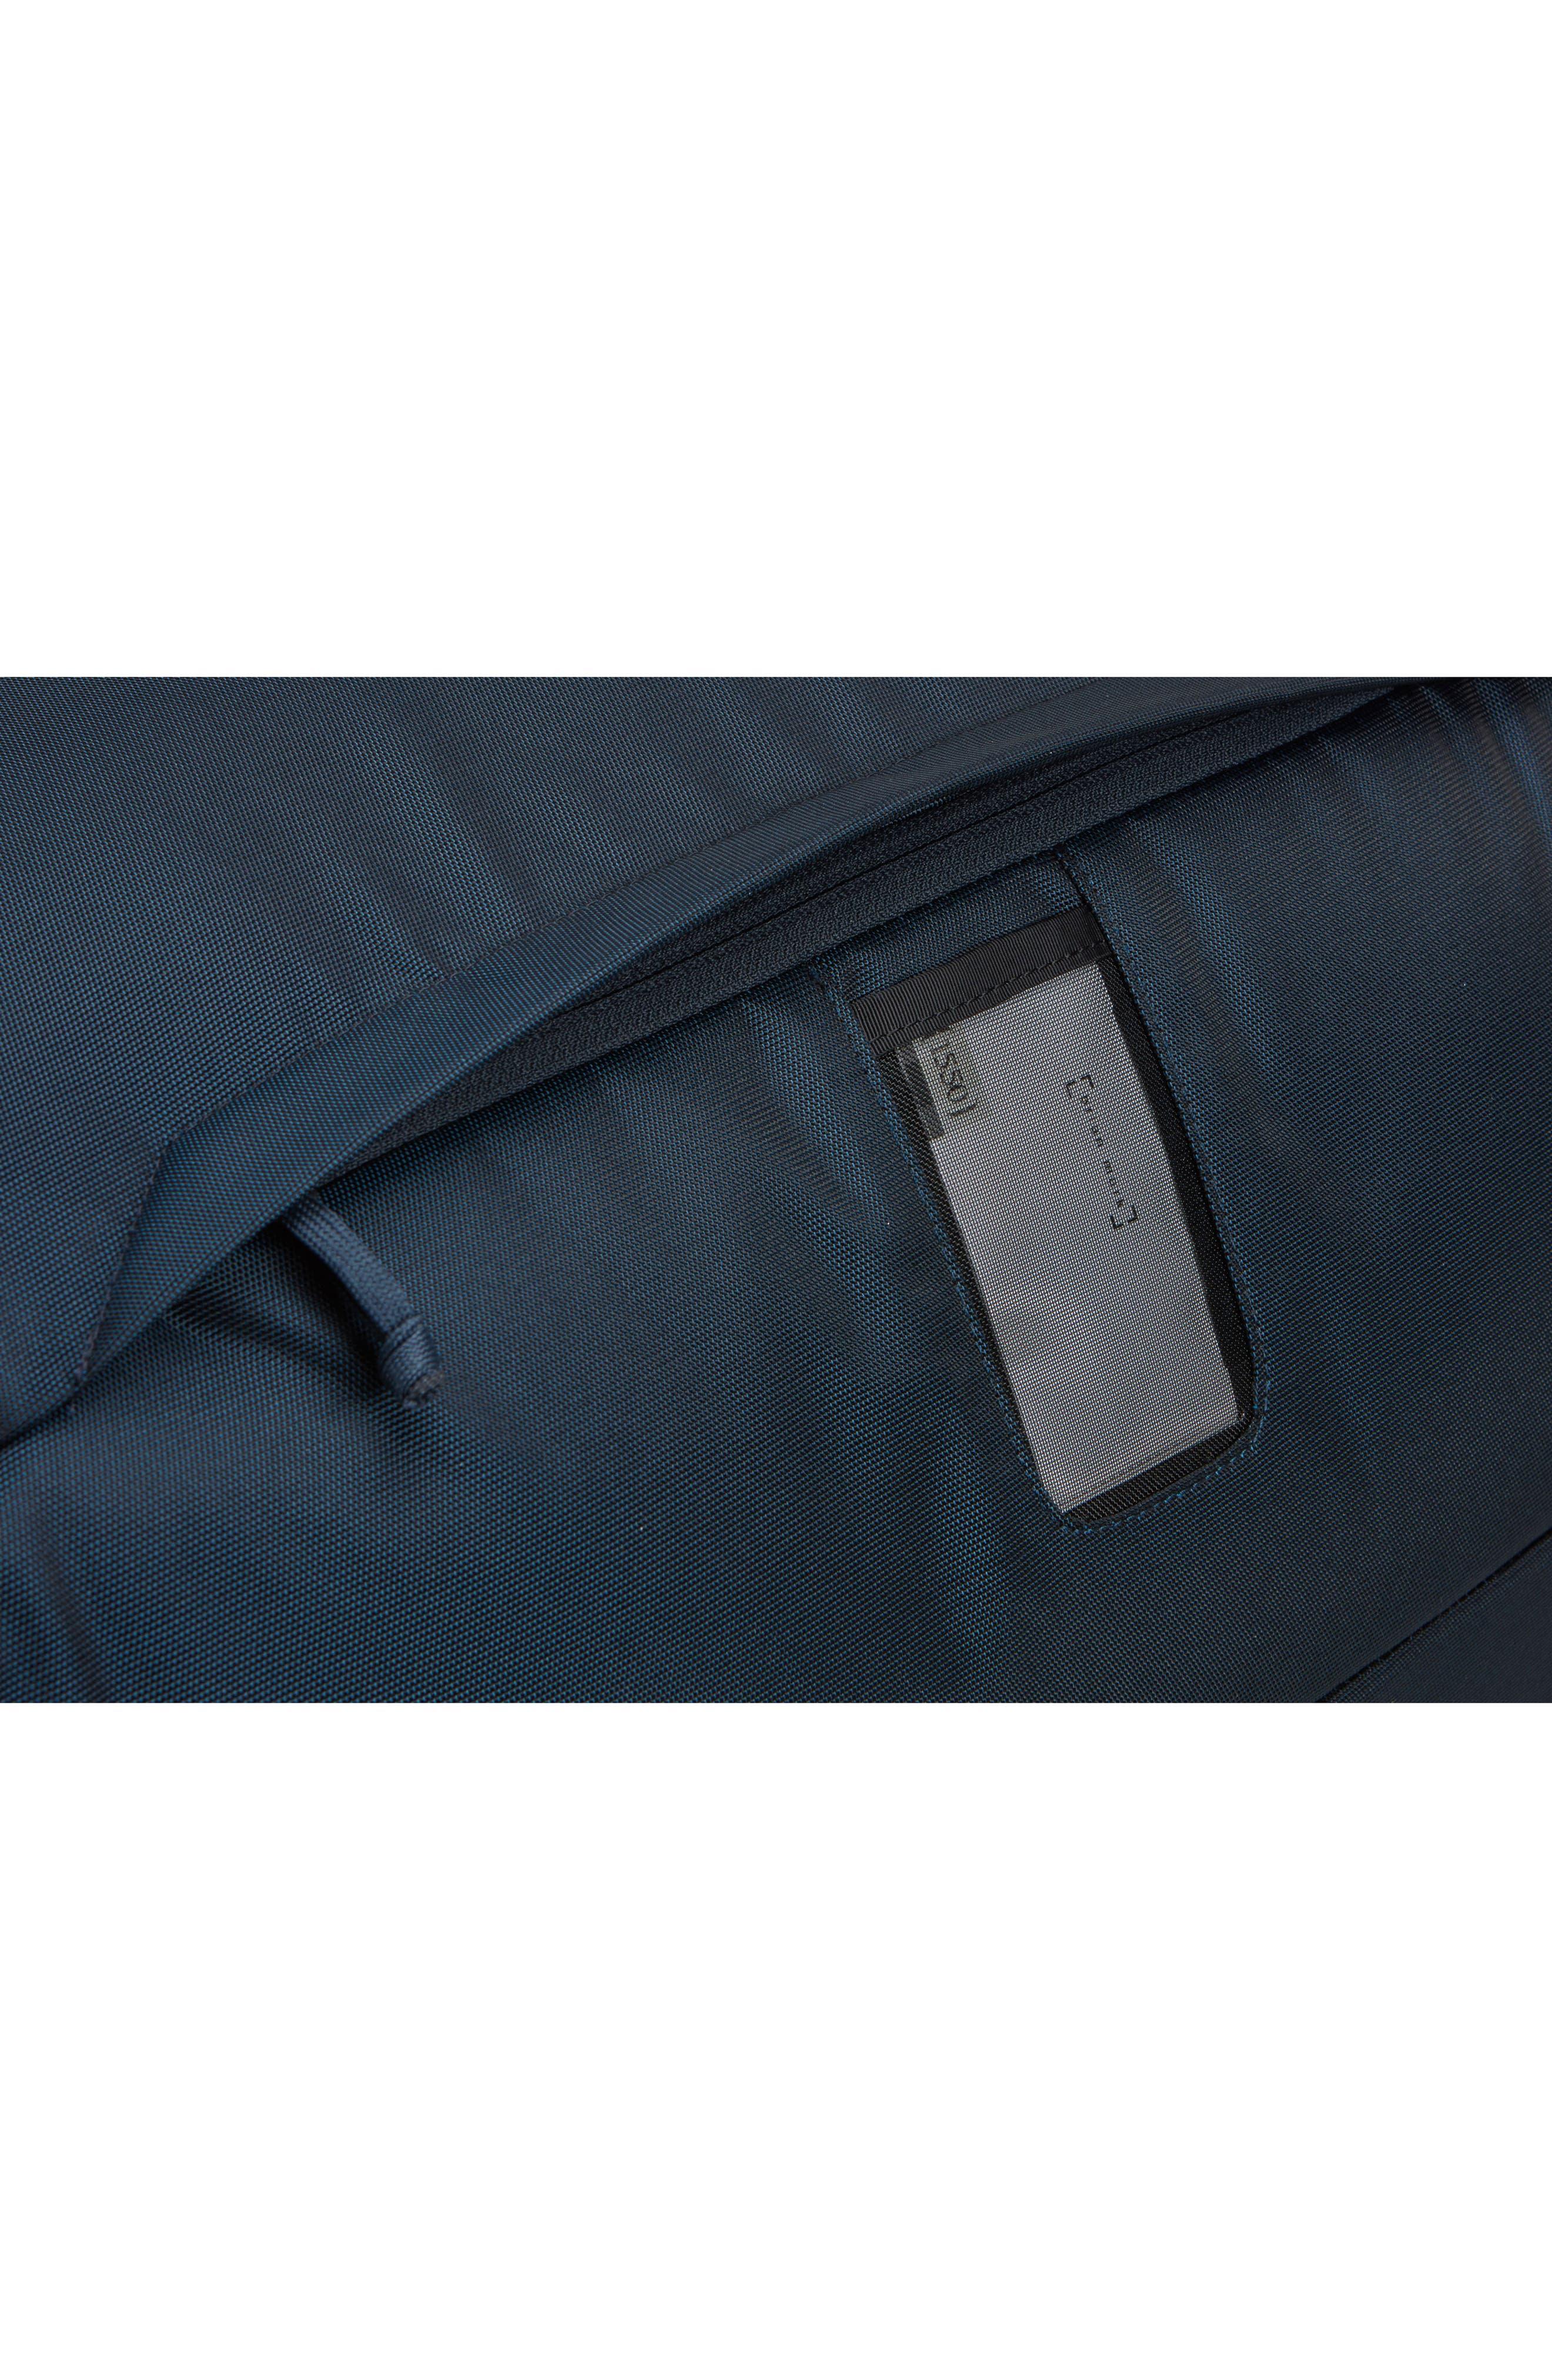 Subterra 60-Liter Duffel Bag,                             Alternate thumbnail 4, color,                             MINERAL